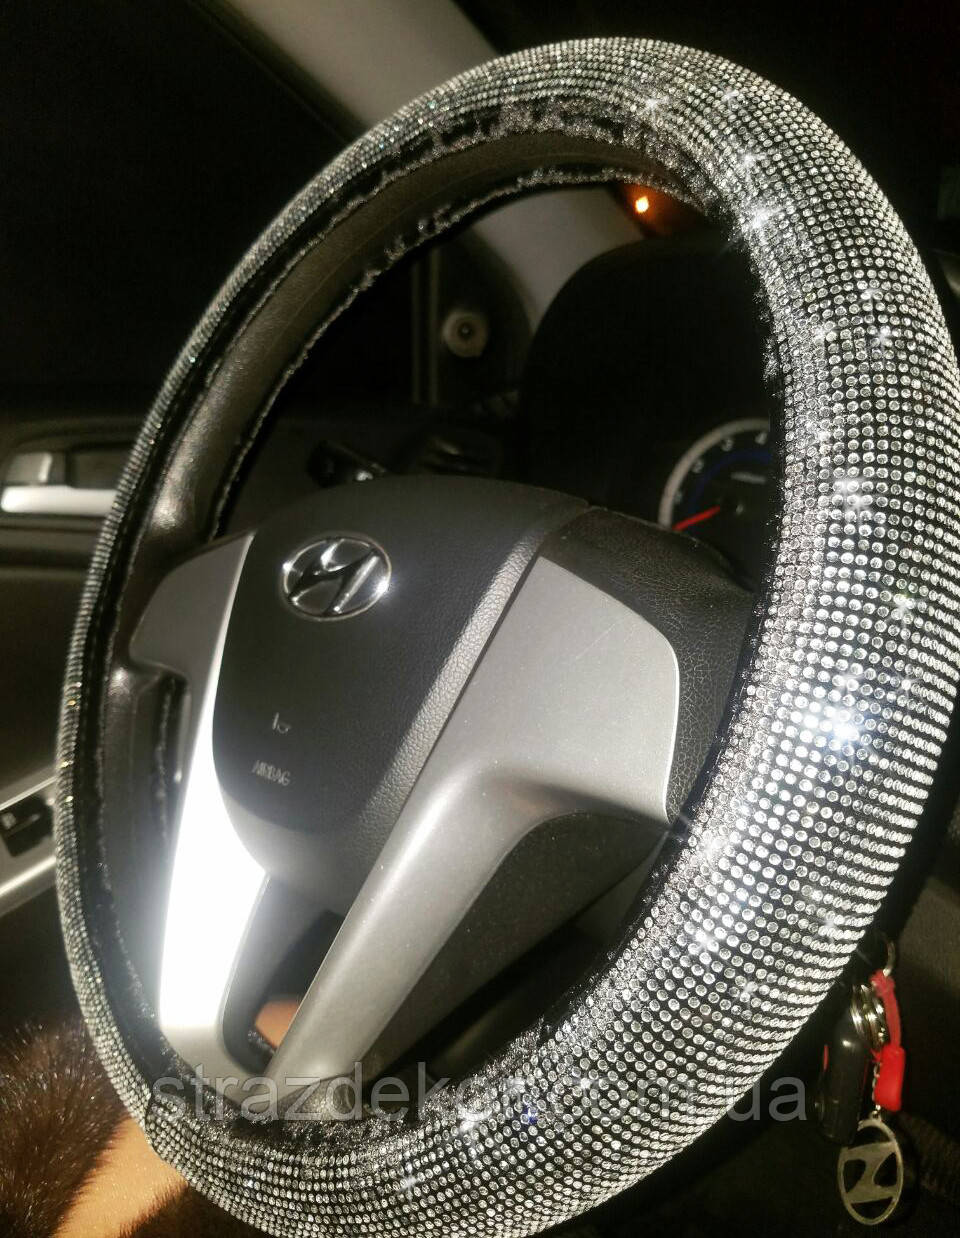 Чехол на руль в стразах кристалл, фото 1